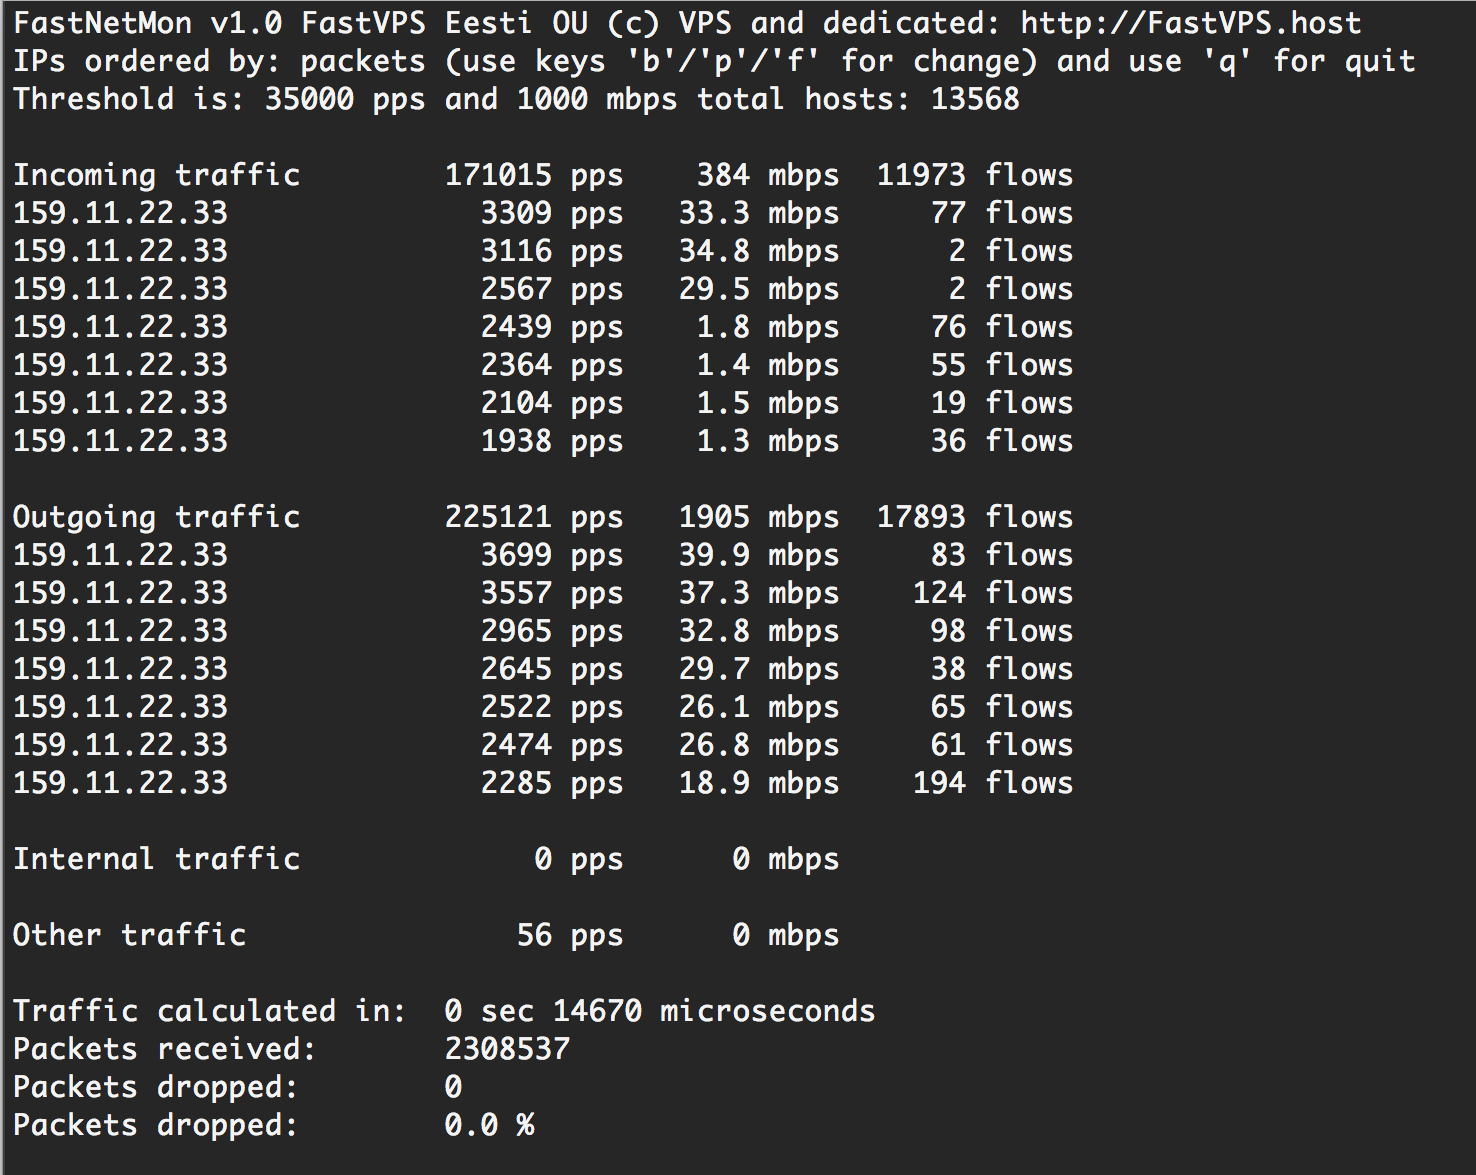 FastNetMon - Very Fast DDoS Analyzer with Sflow/Netflow/Mirror Support